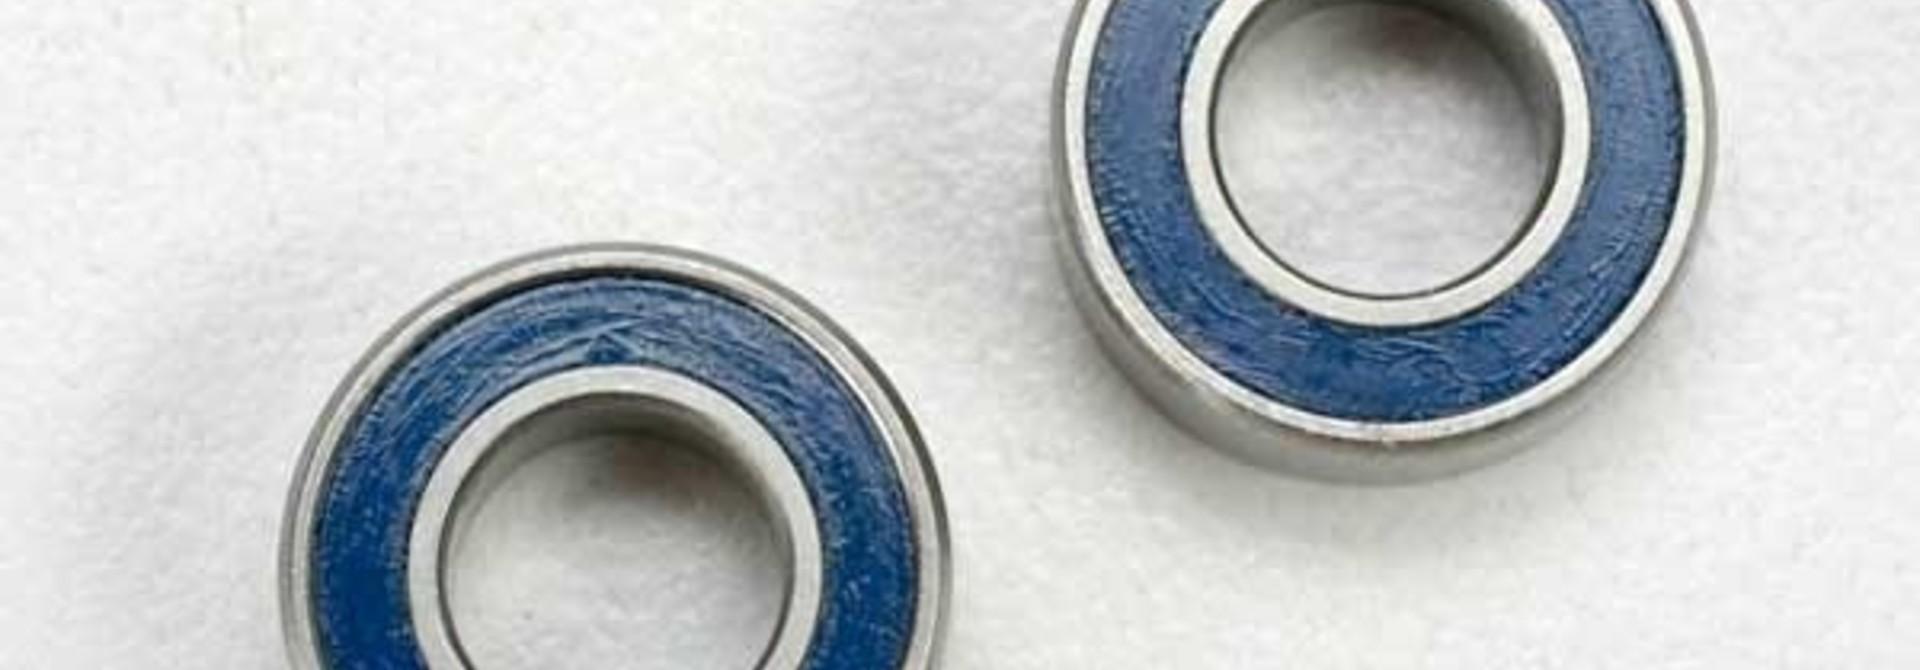 Ball bearings, blue rubber sealed (6x12x4mm) (2), TRX5117